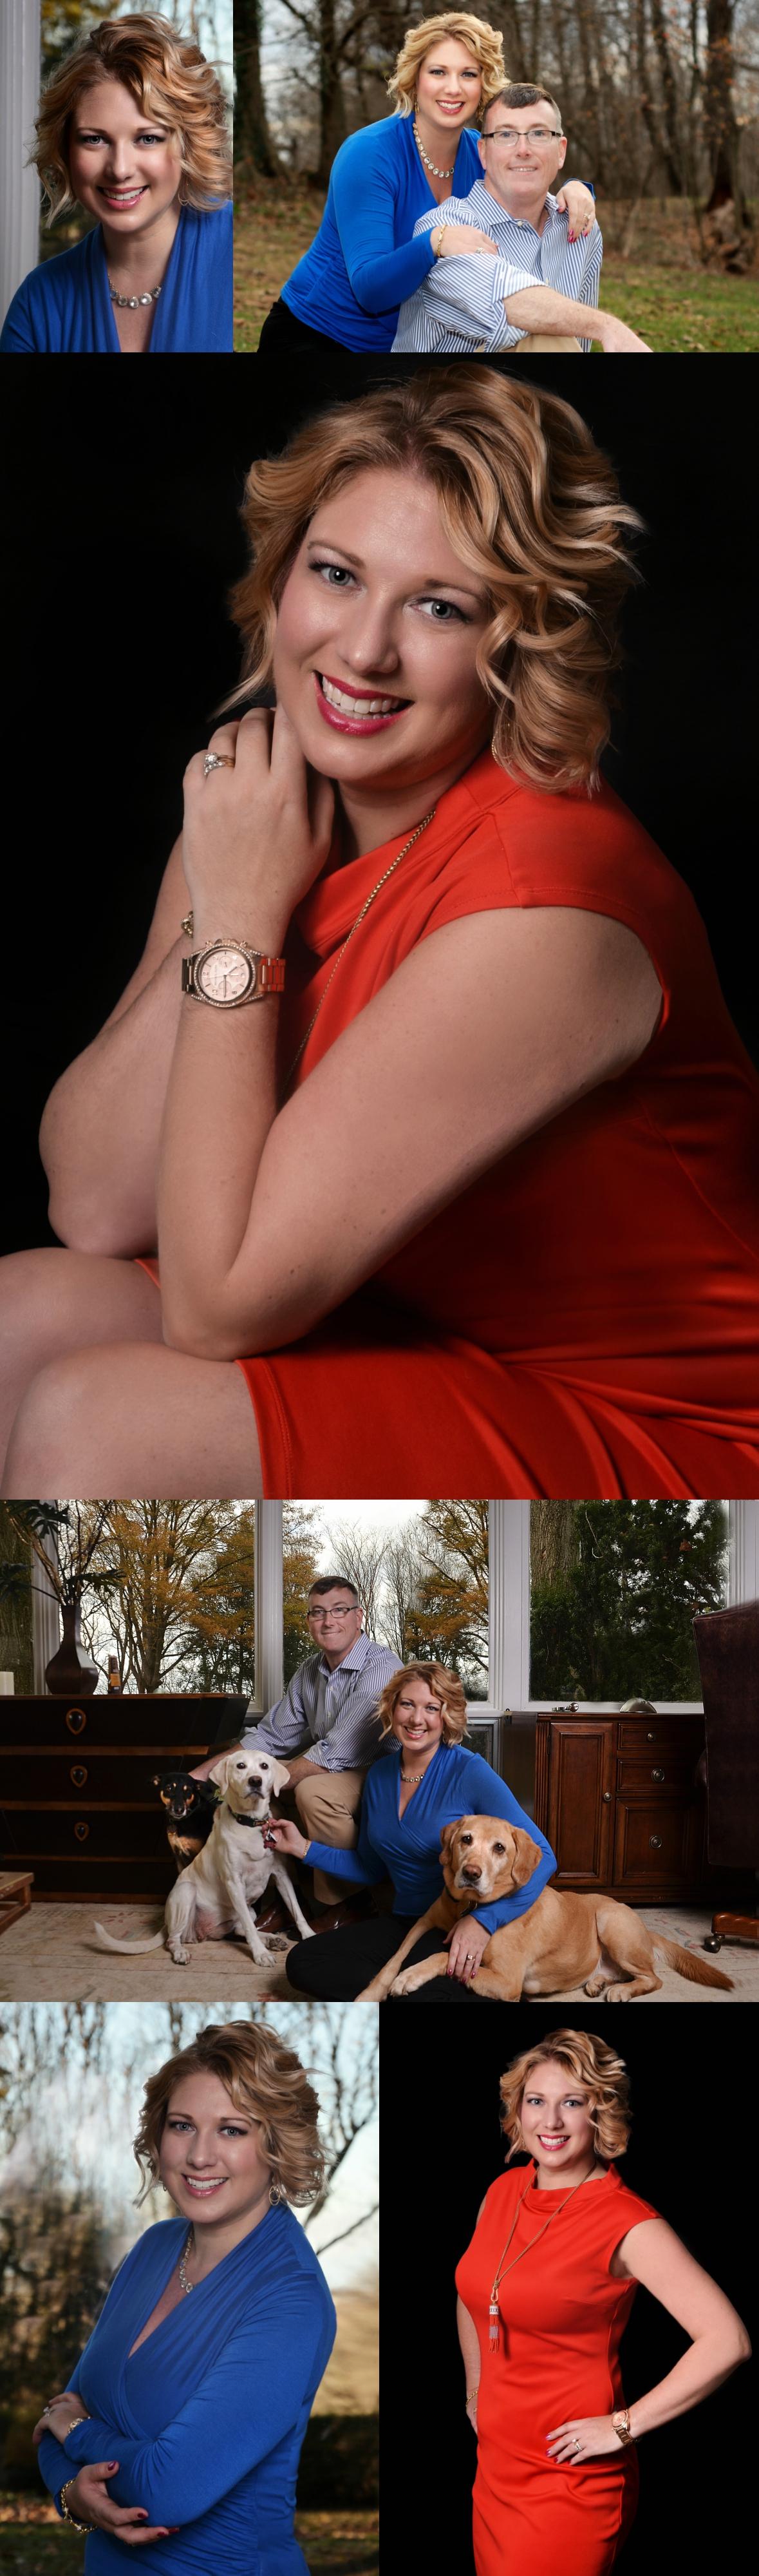 meredith jorgensen cooke life and legacies lancaster lebanon harrisburg pennsylvania photographer portrait artist preserving stories images storyteller kat squibb portraits personal branding family photographer